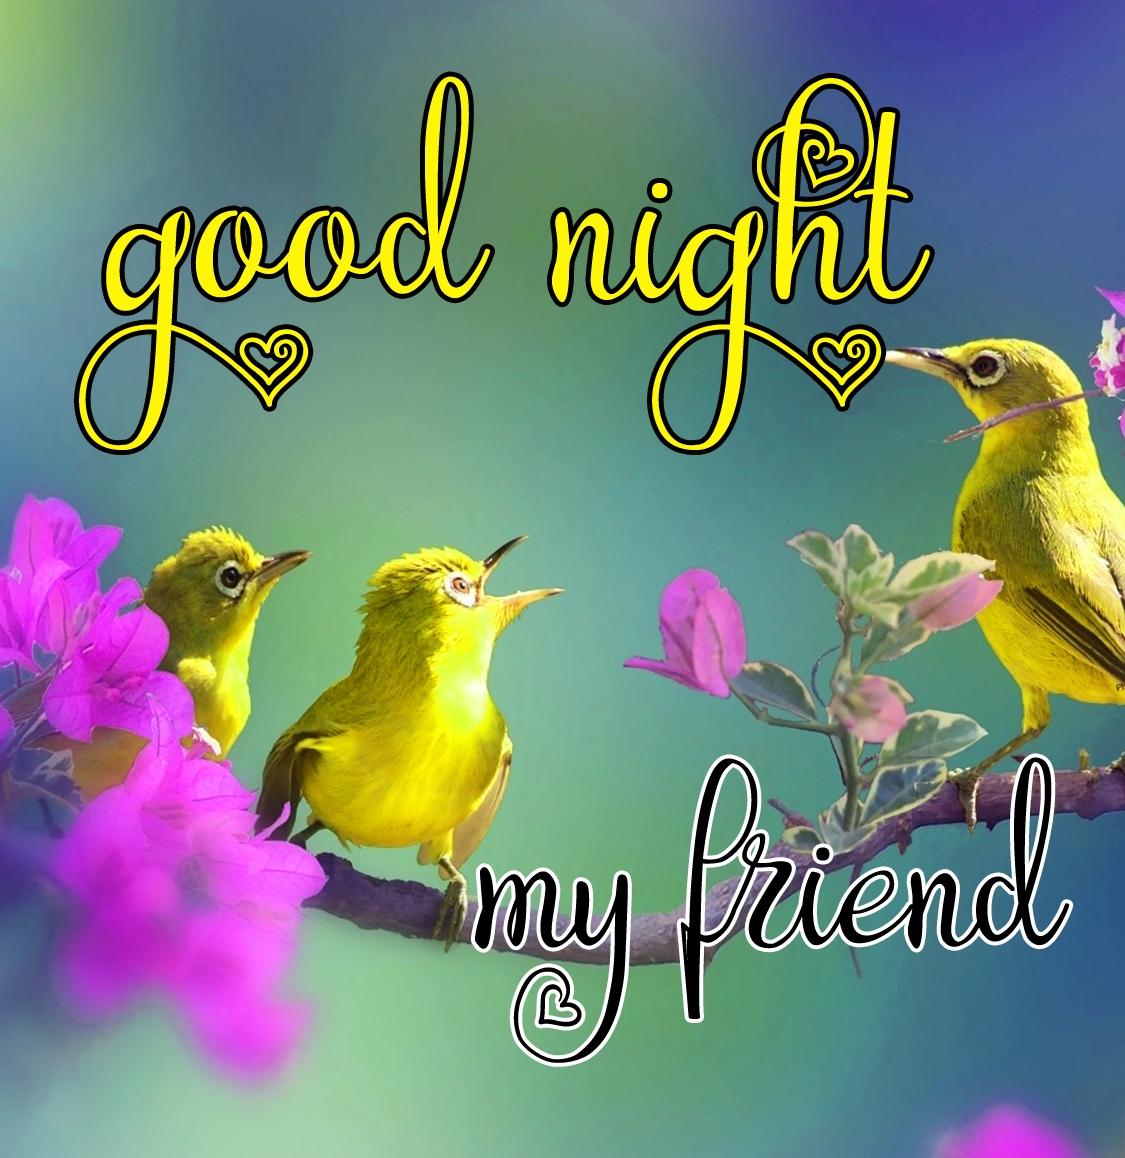 Free good night Images 52